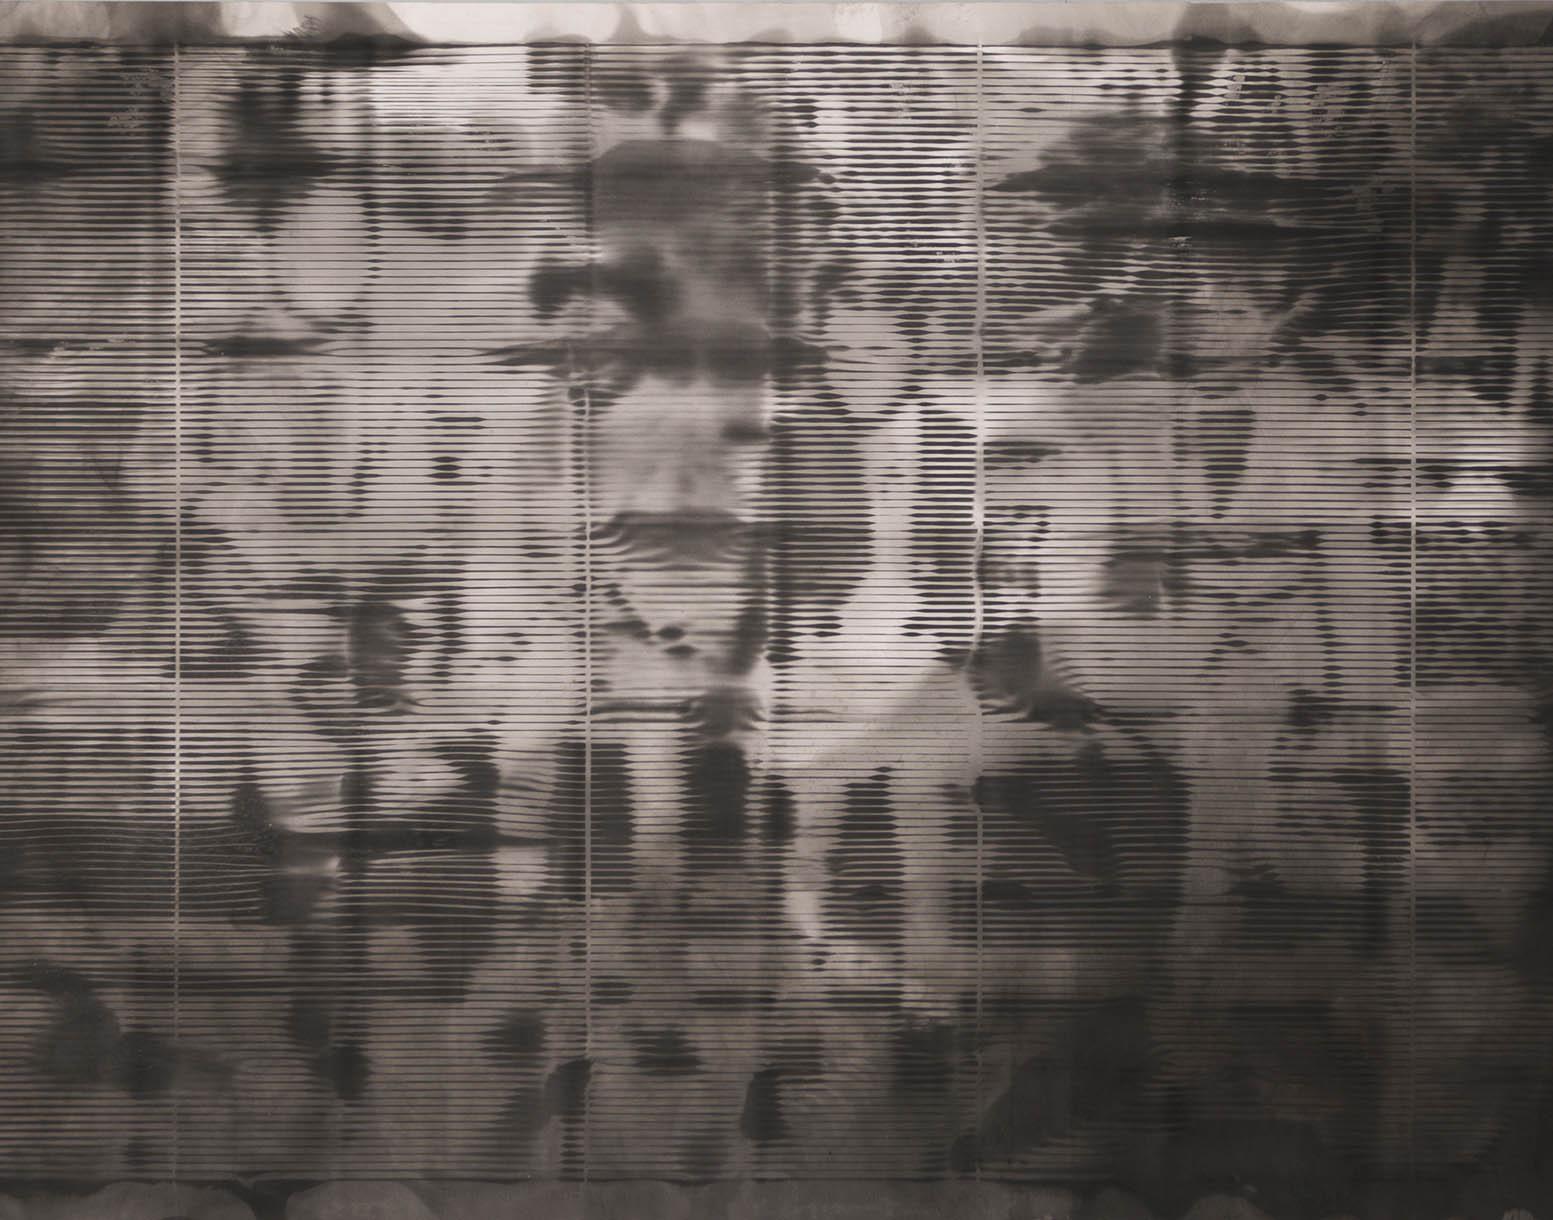 Serie álbum de Luis Calfuquir / 2017